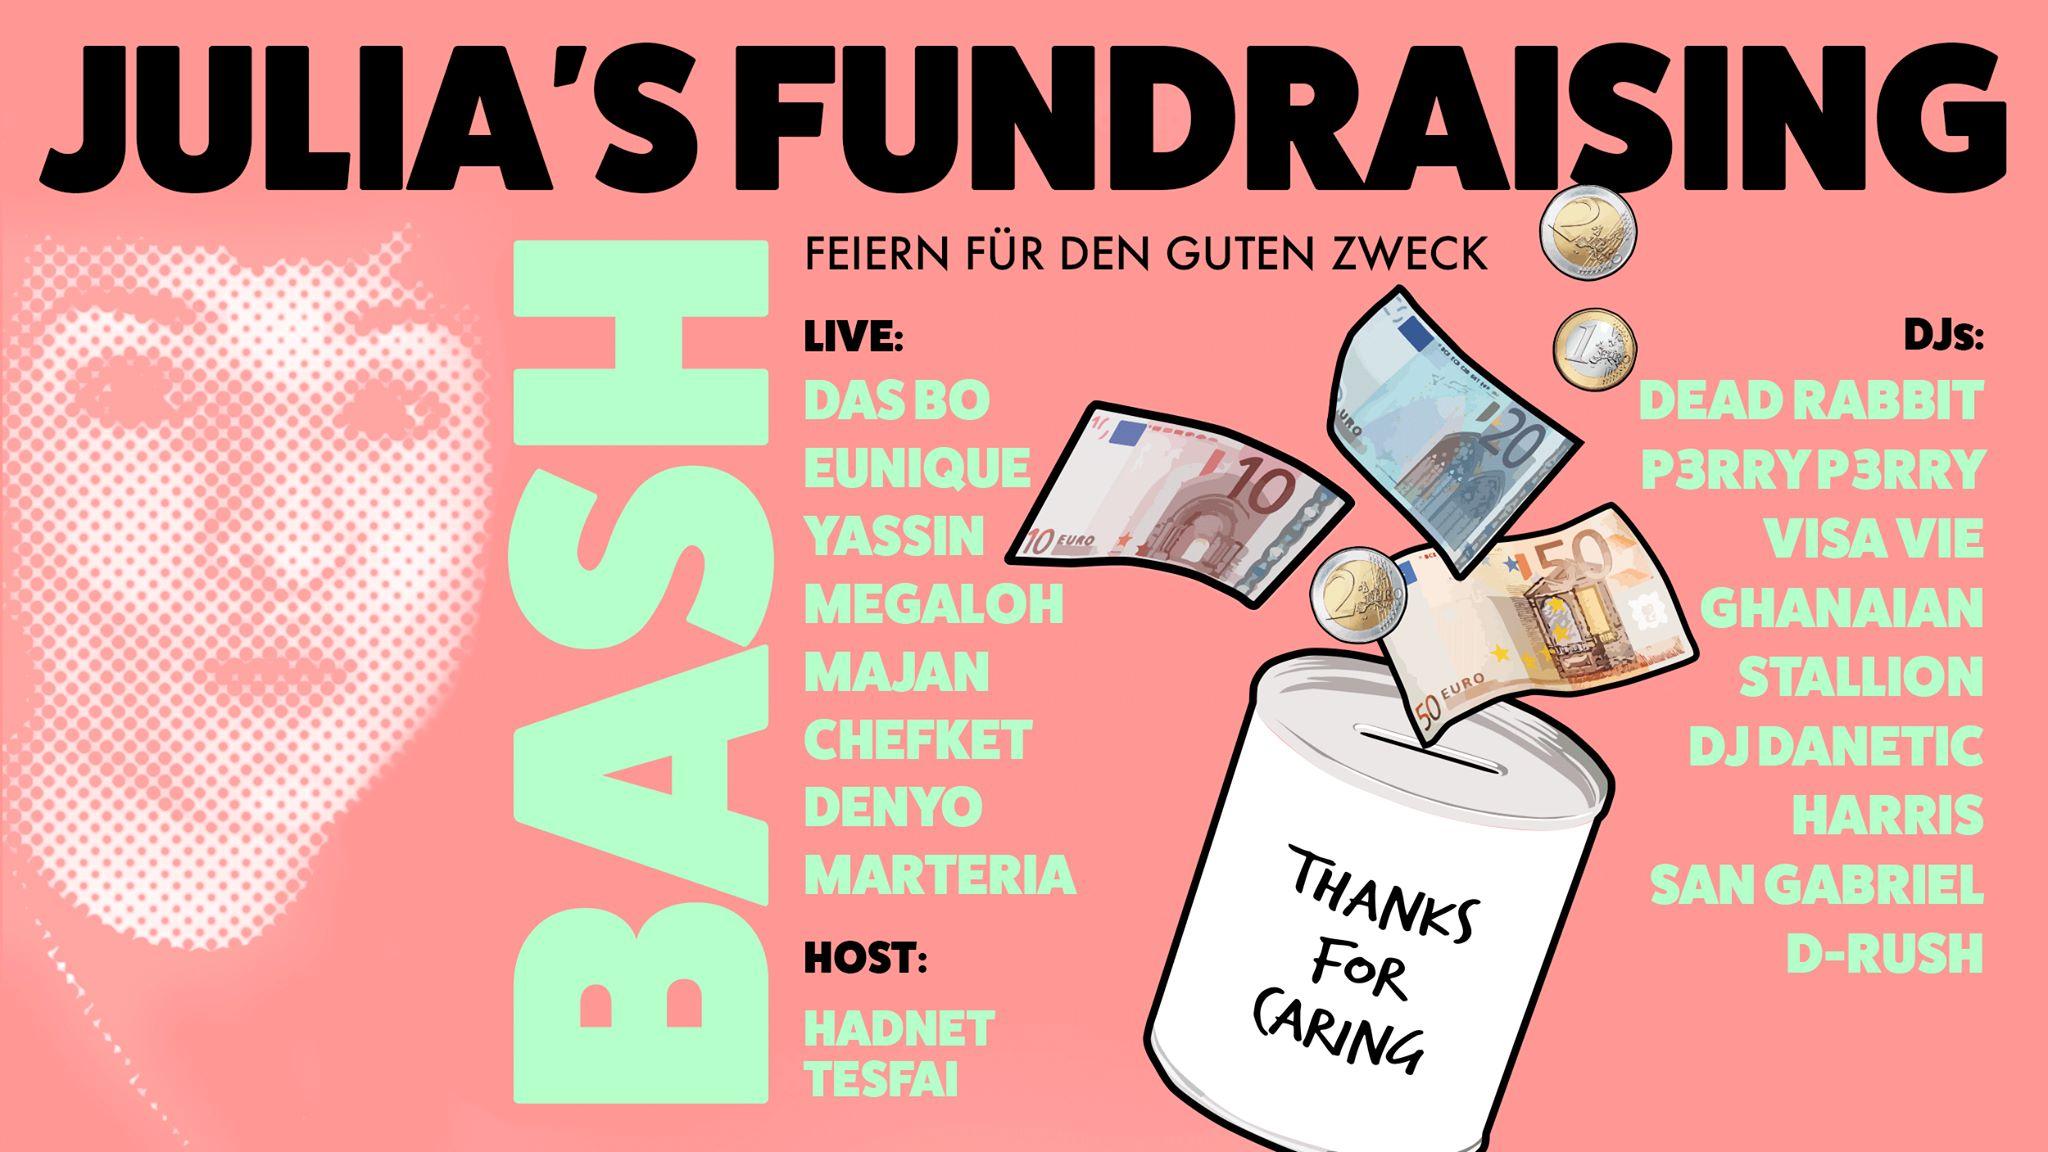 Julia-Fundraising-Bash